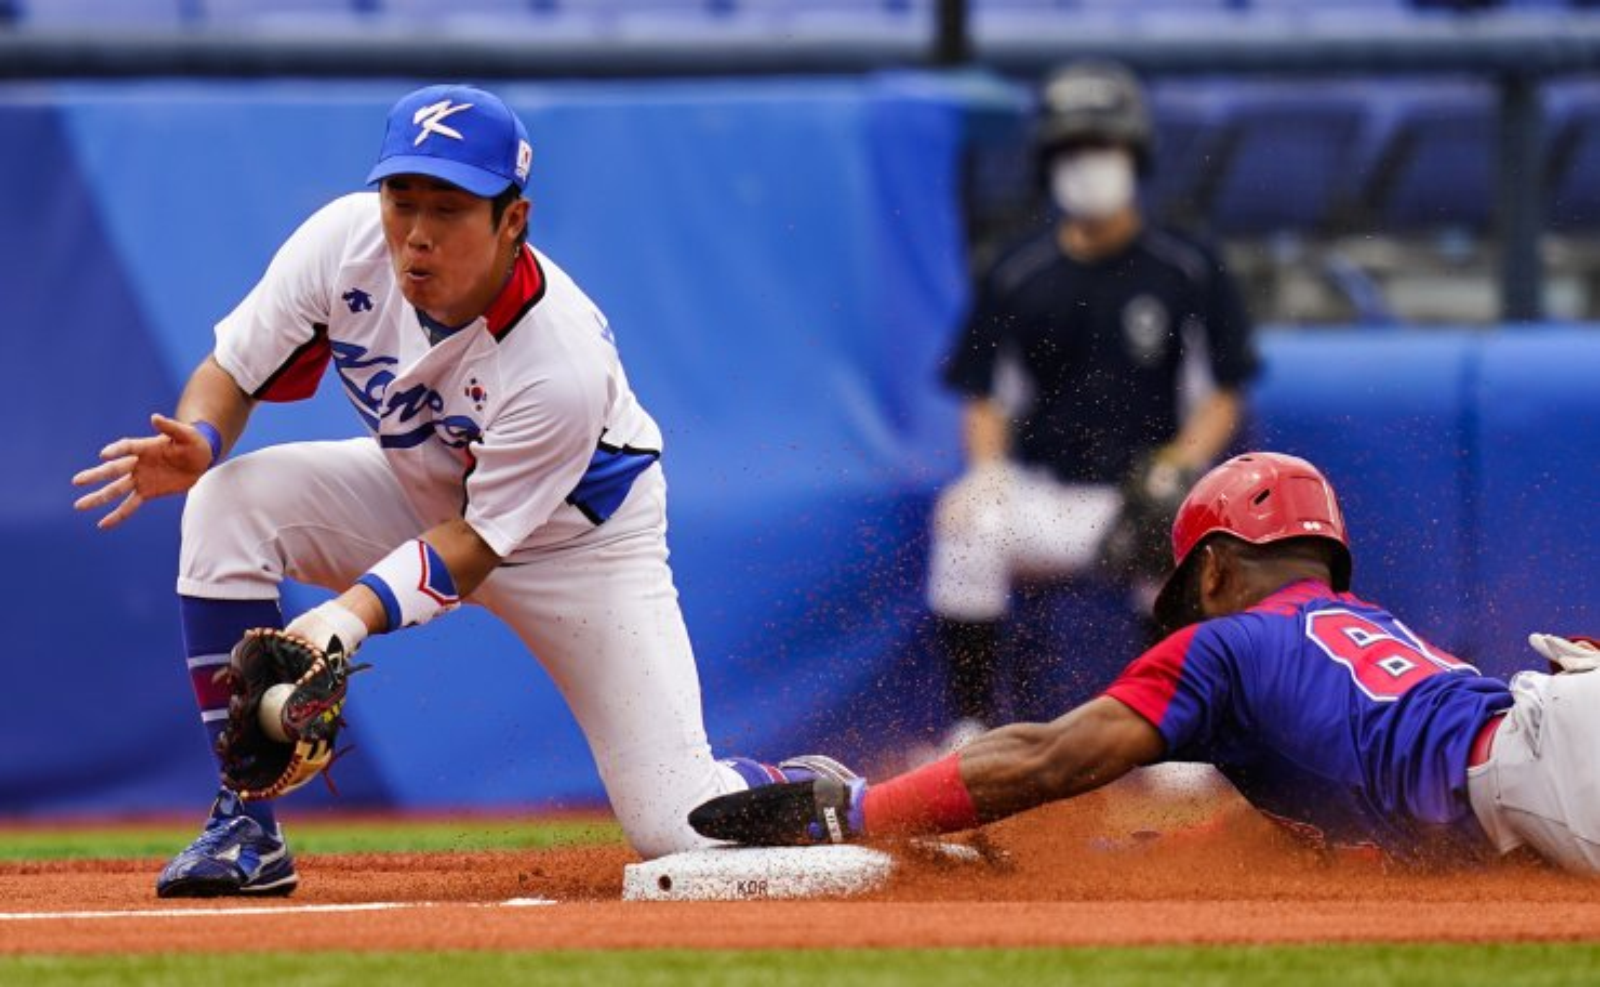 Dominican Republic's Emilio Bonifacio steal third base past Kyoungmin Hur during the bronze medal baseball game at the 2020 Summer Olympics, Saturday, Aug. 7, 2021, in Yokohama, Japan. AP